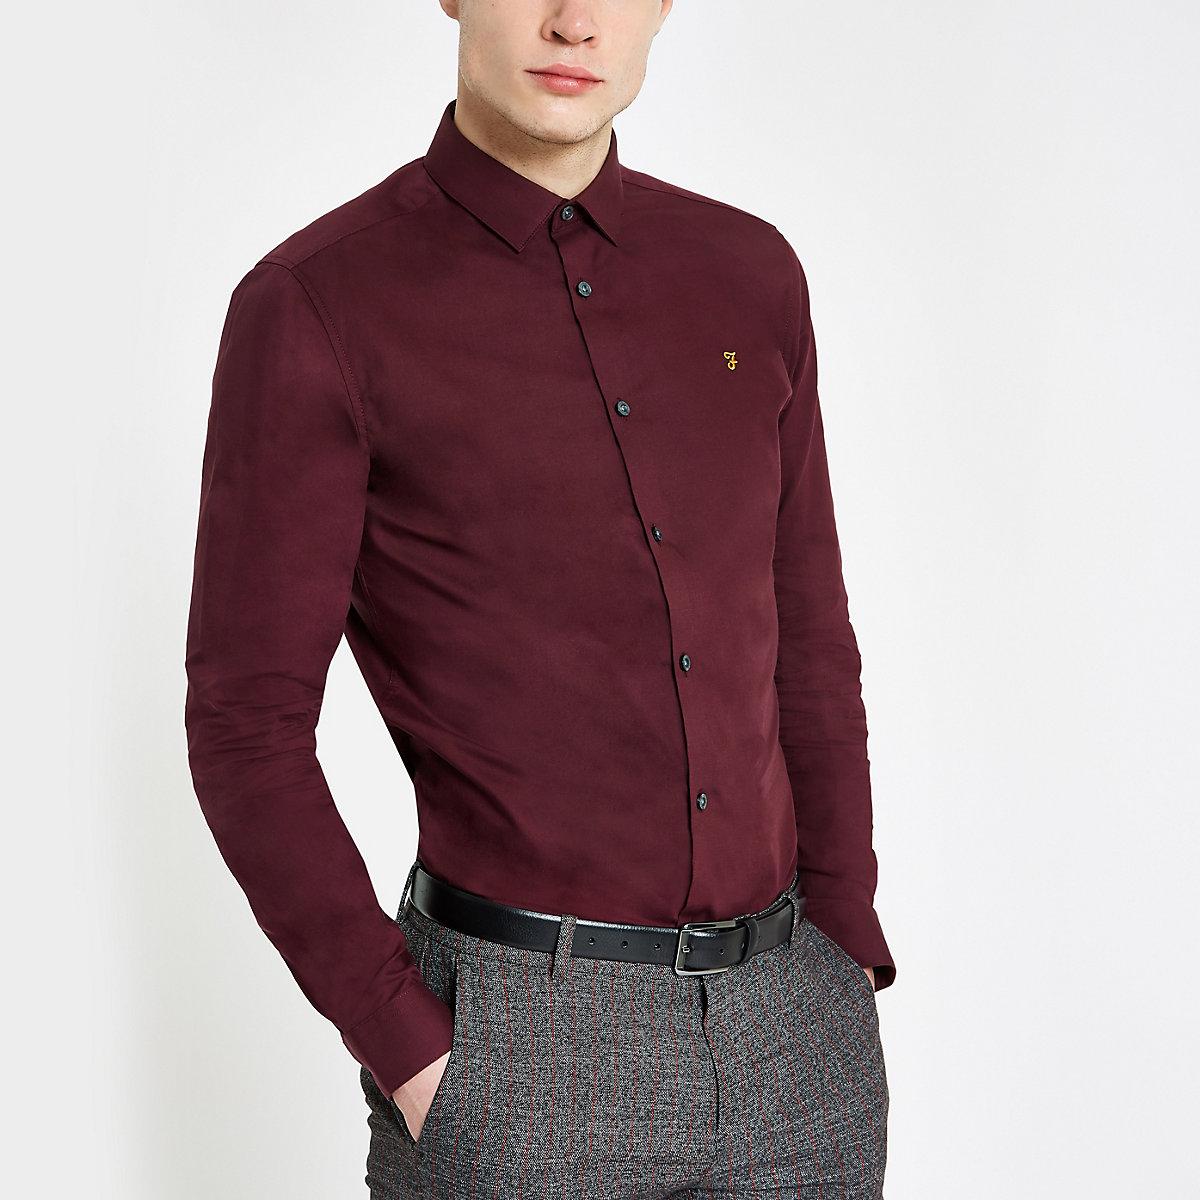 Farah burgundy button-down shirt